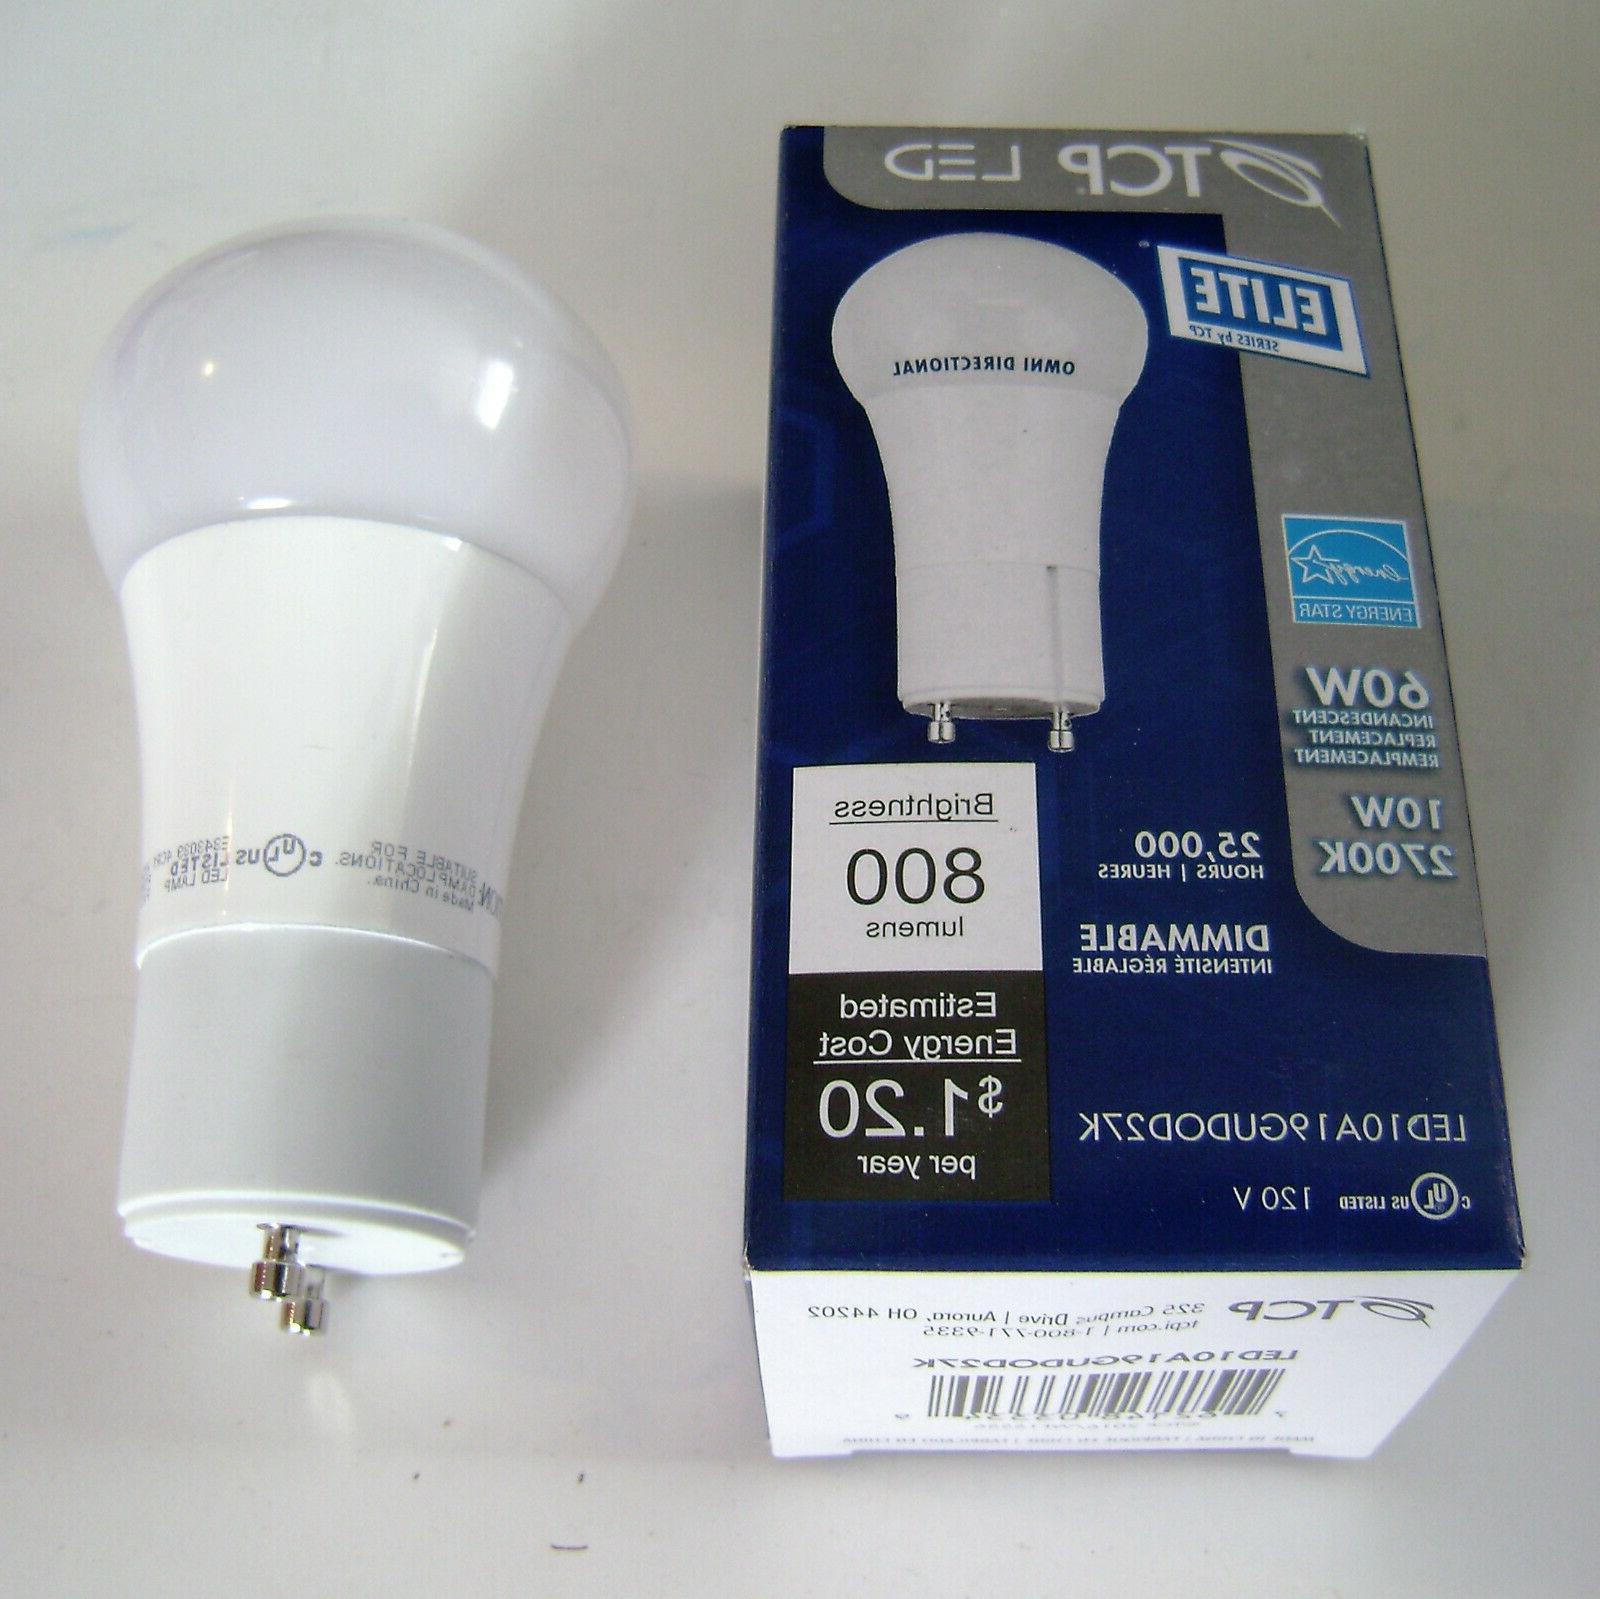 TCP 10W  2700K GU24 Dimmable LED Light Bulb LED10A19GUDOD27K